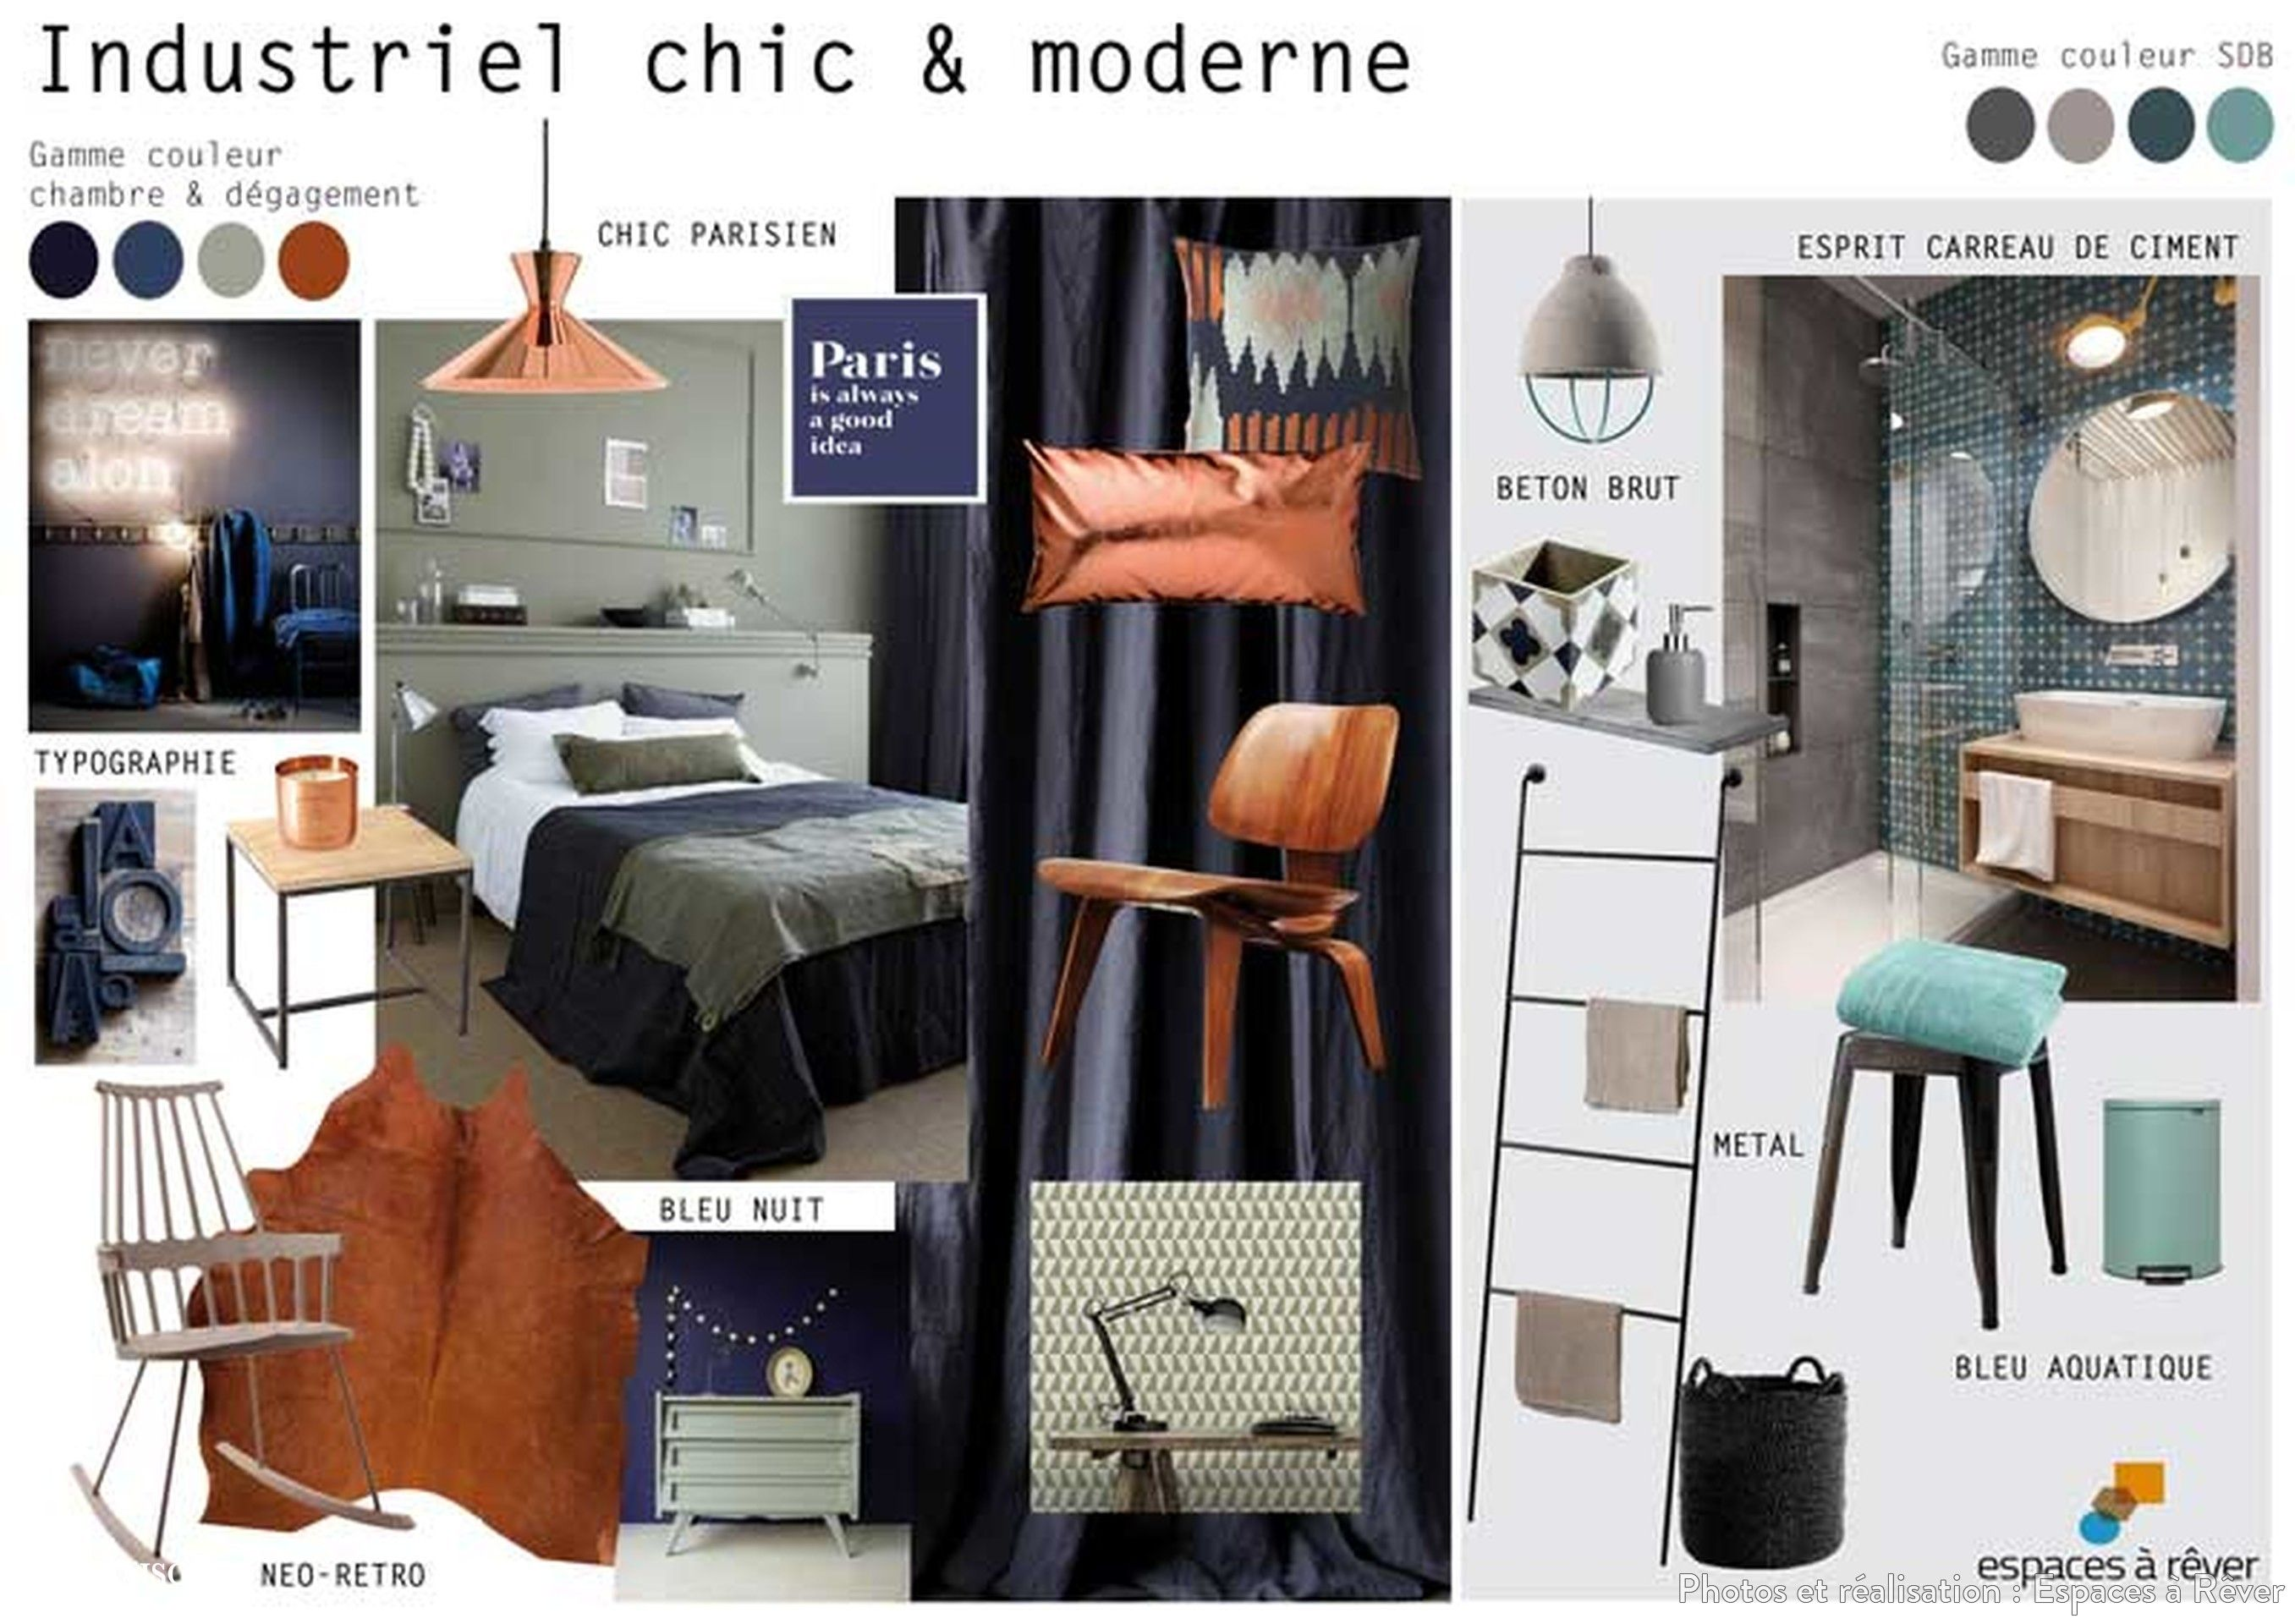 pingl par marion huguet sur appart pinterest. Black Bedroom Furniture Sets. Home Design Ideas